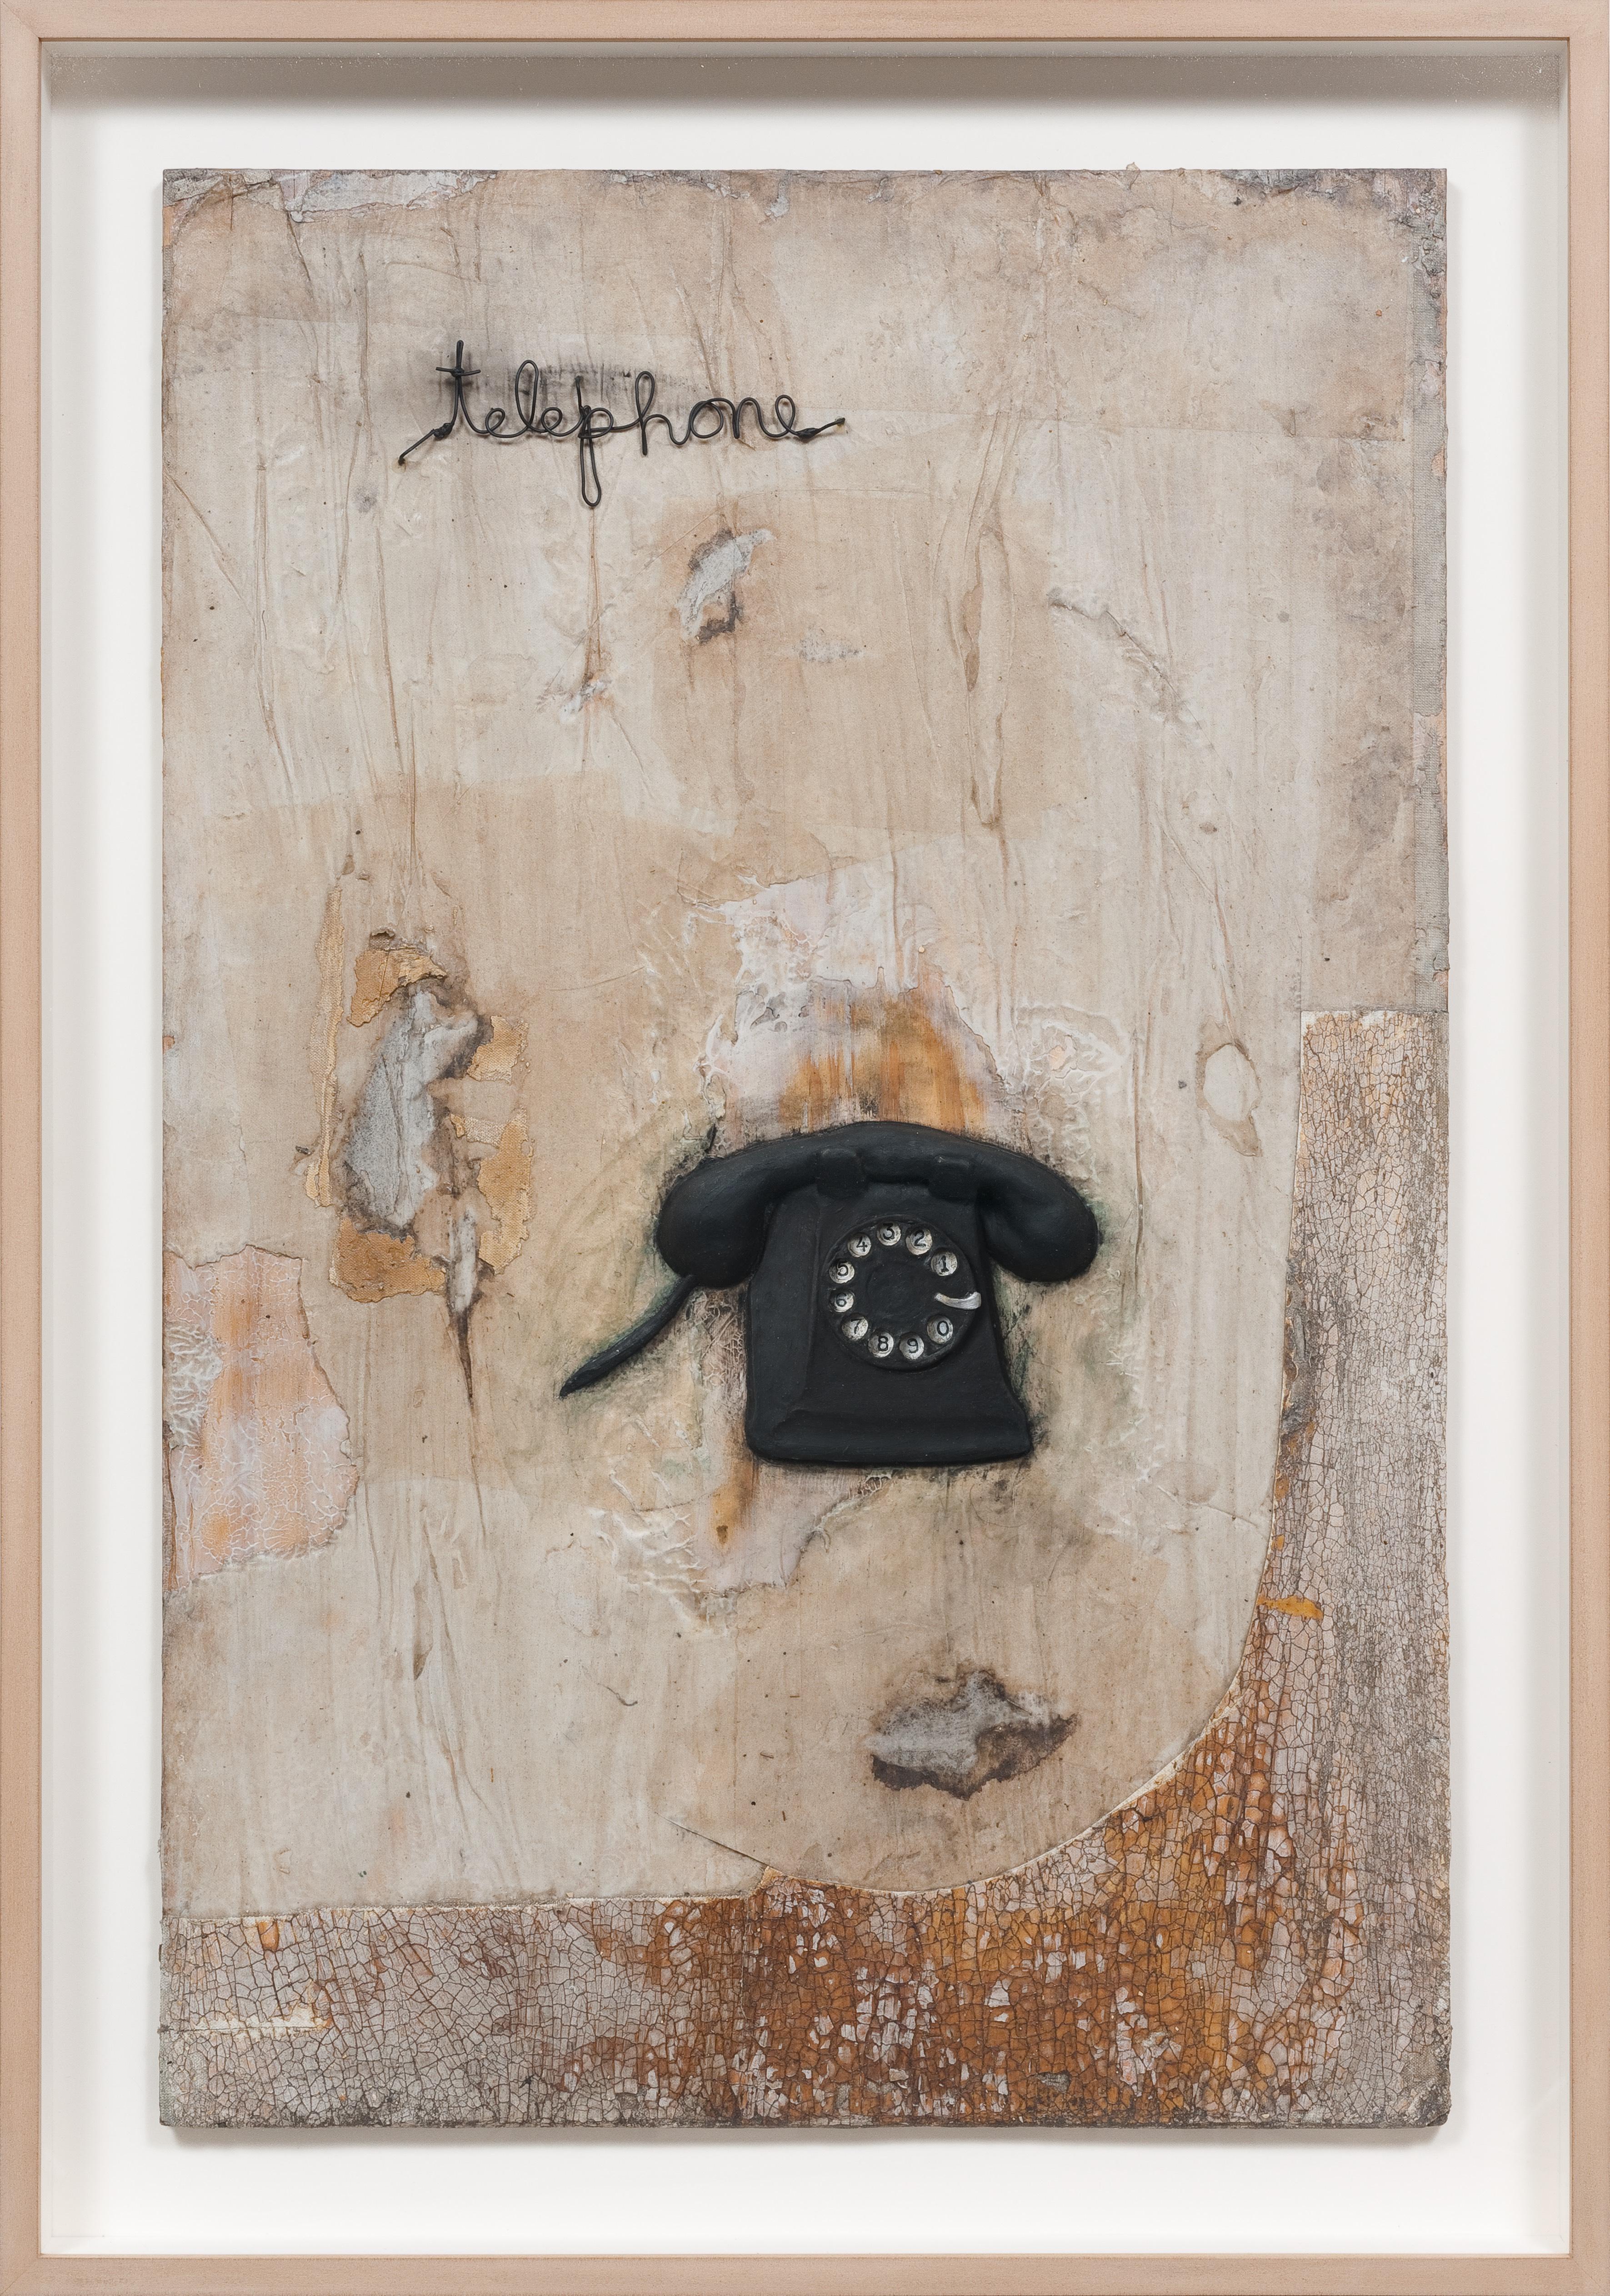 David Lynch, Telephone, 2012